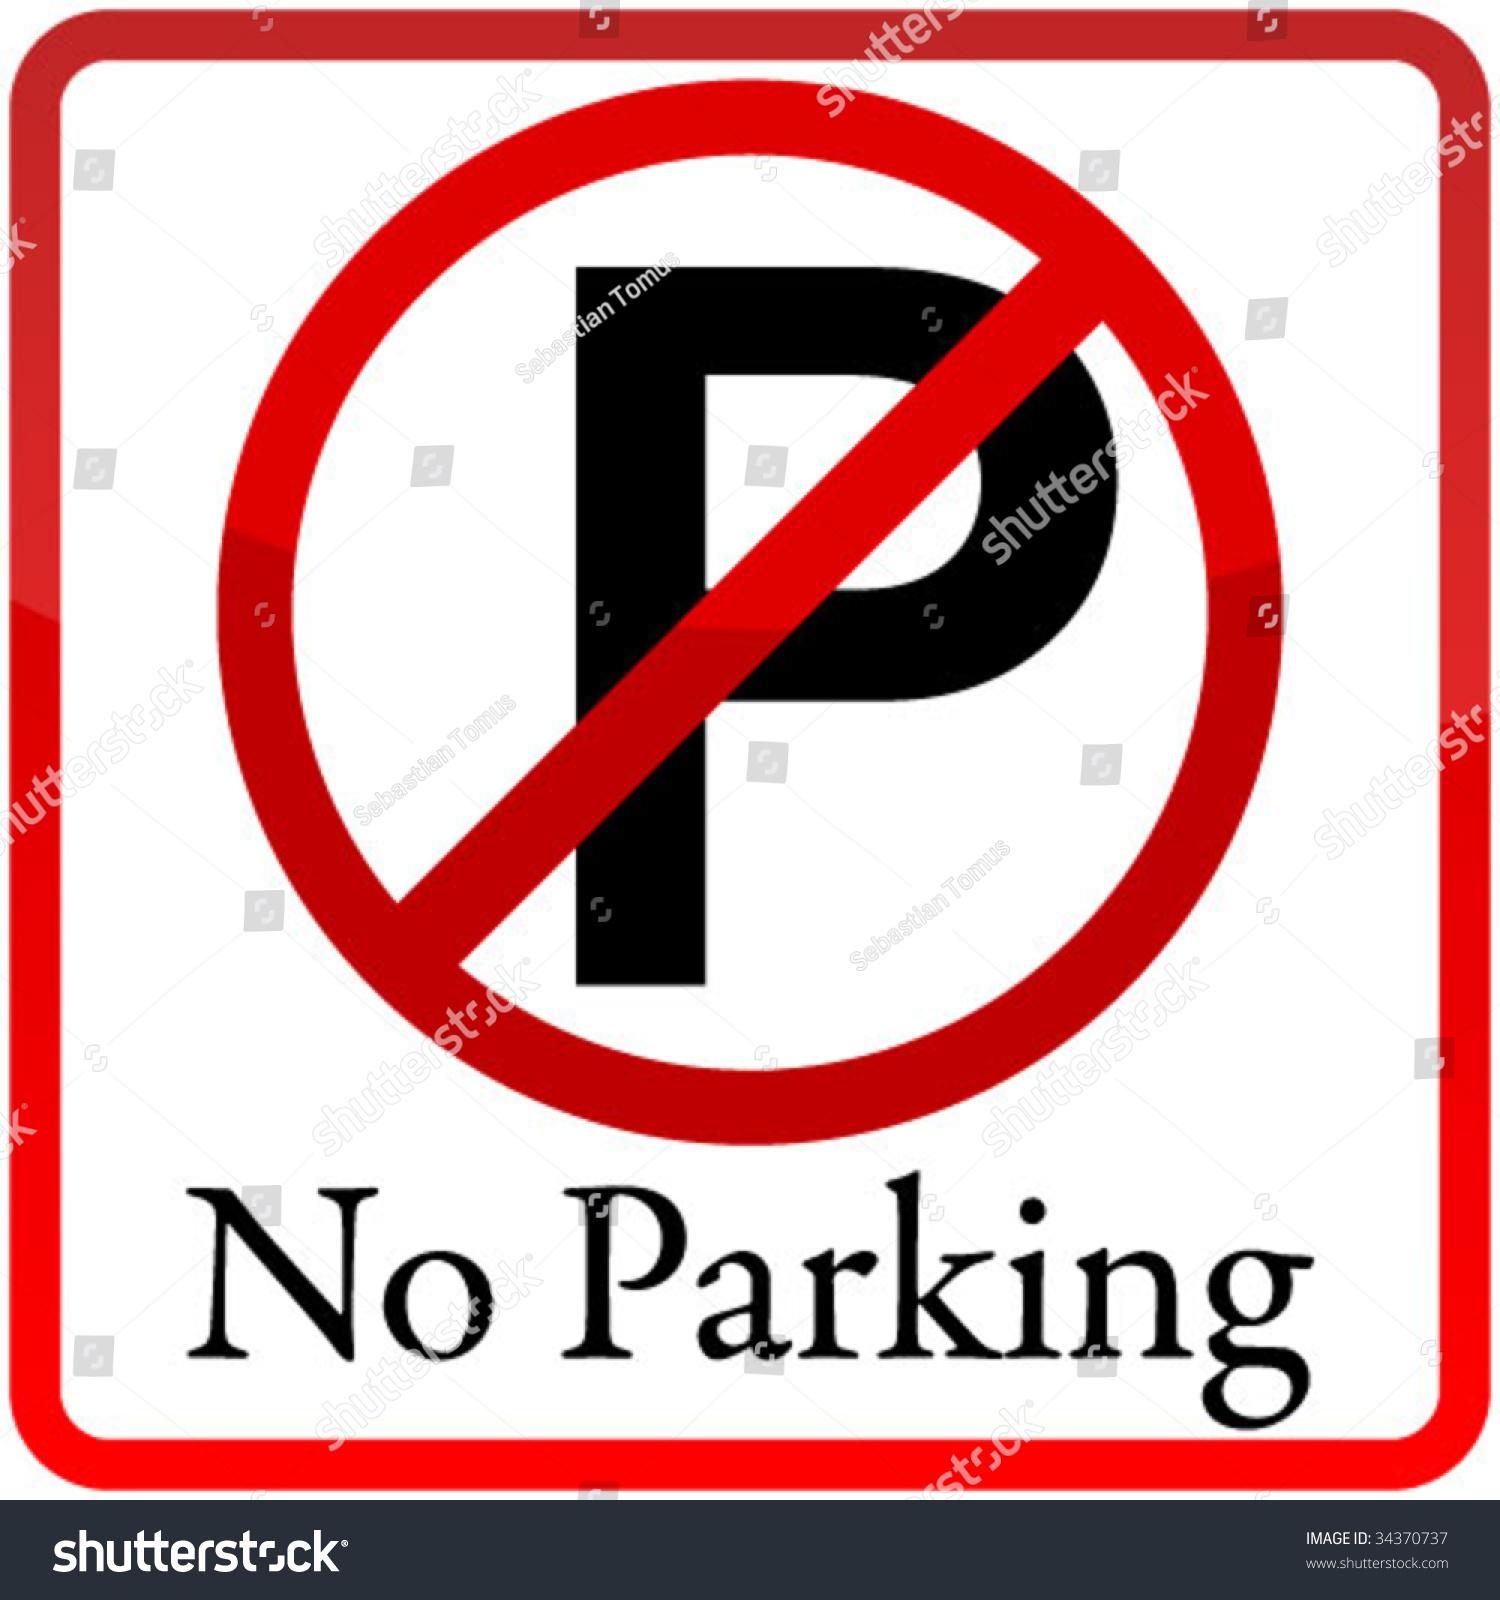 No Parking Sign Stock Vector 34370737 - Shutterstock